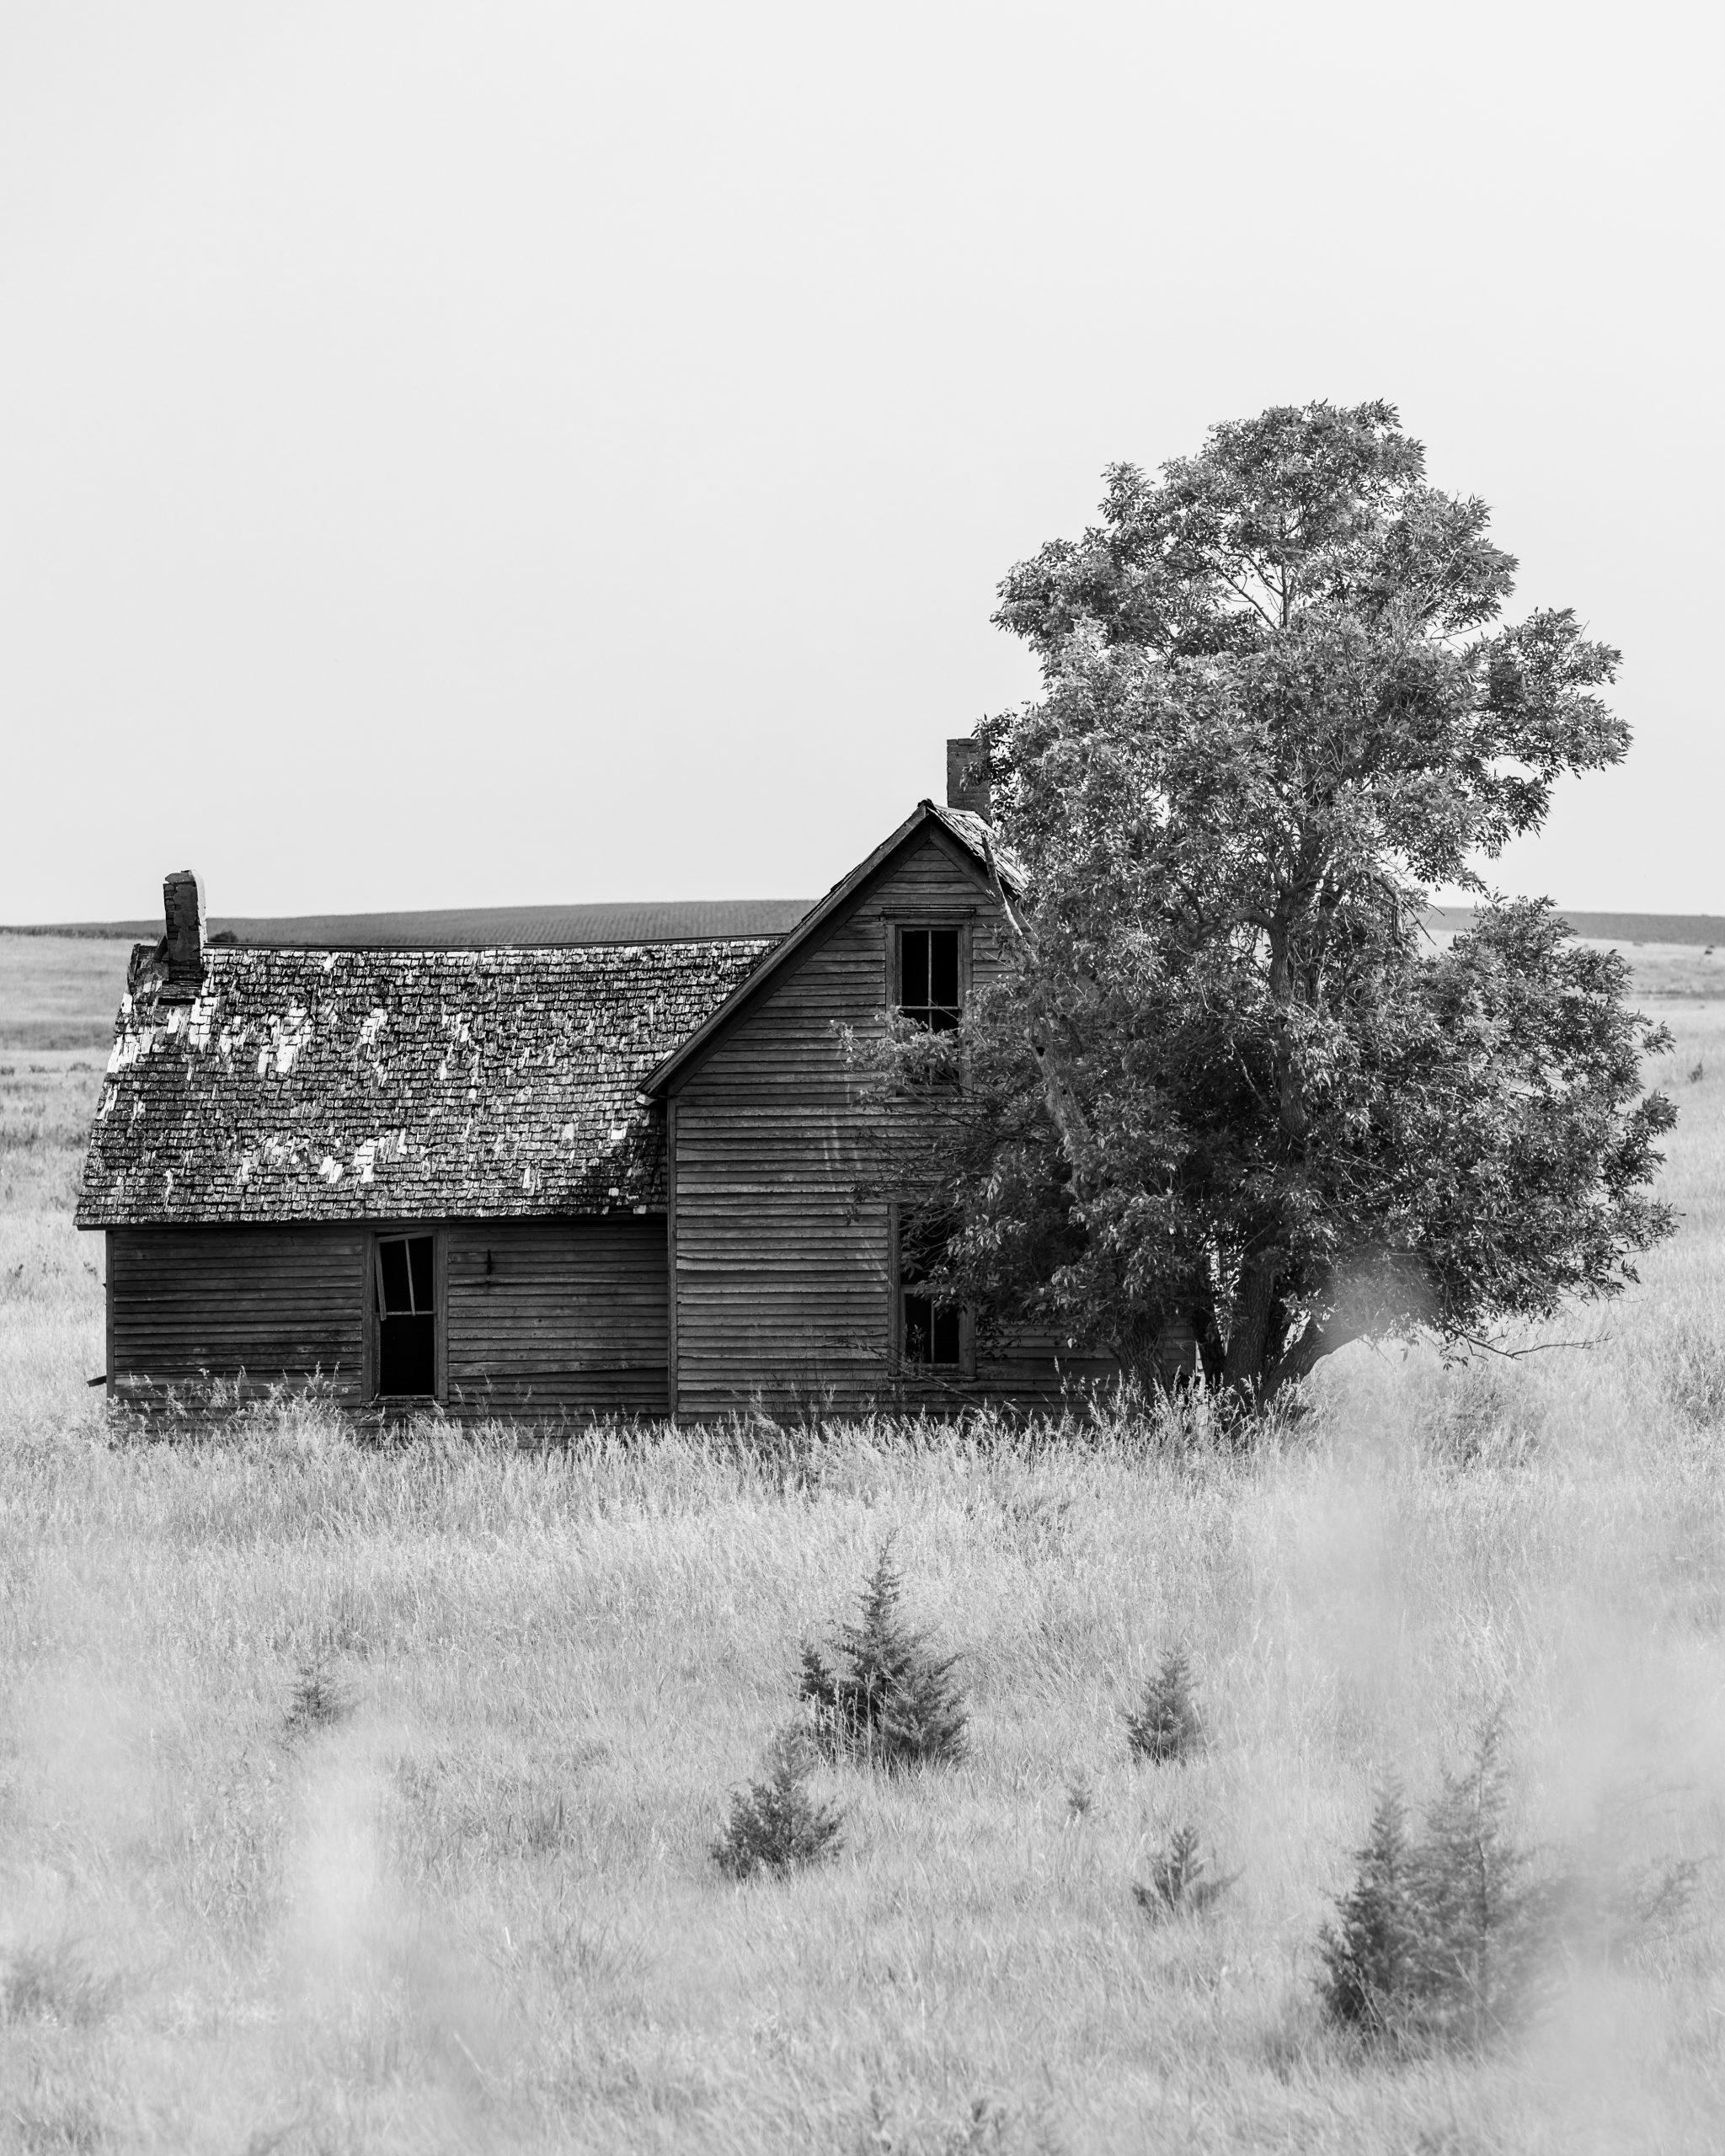 Nebraska – the good life